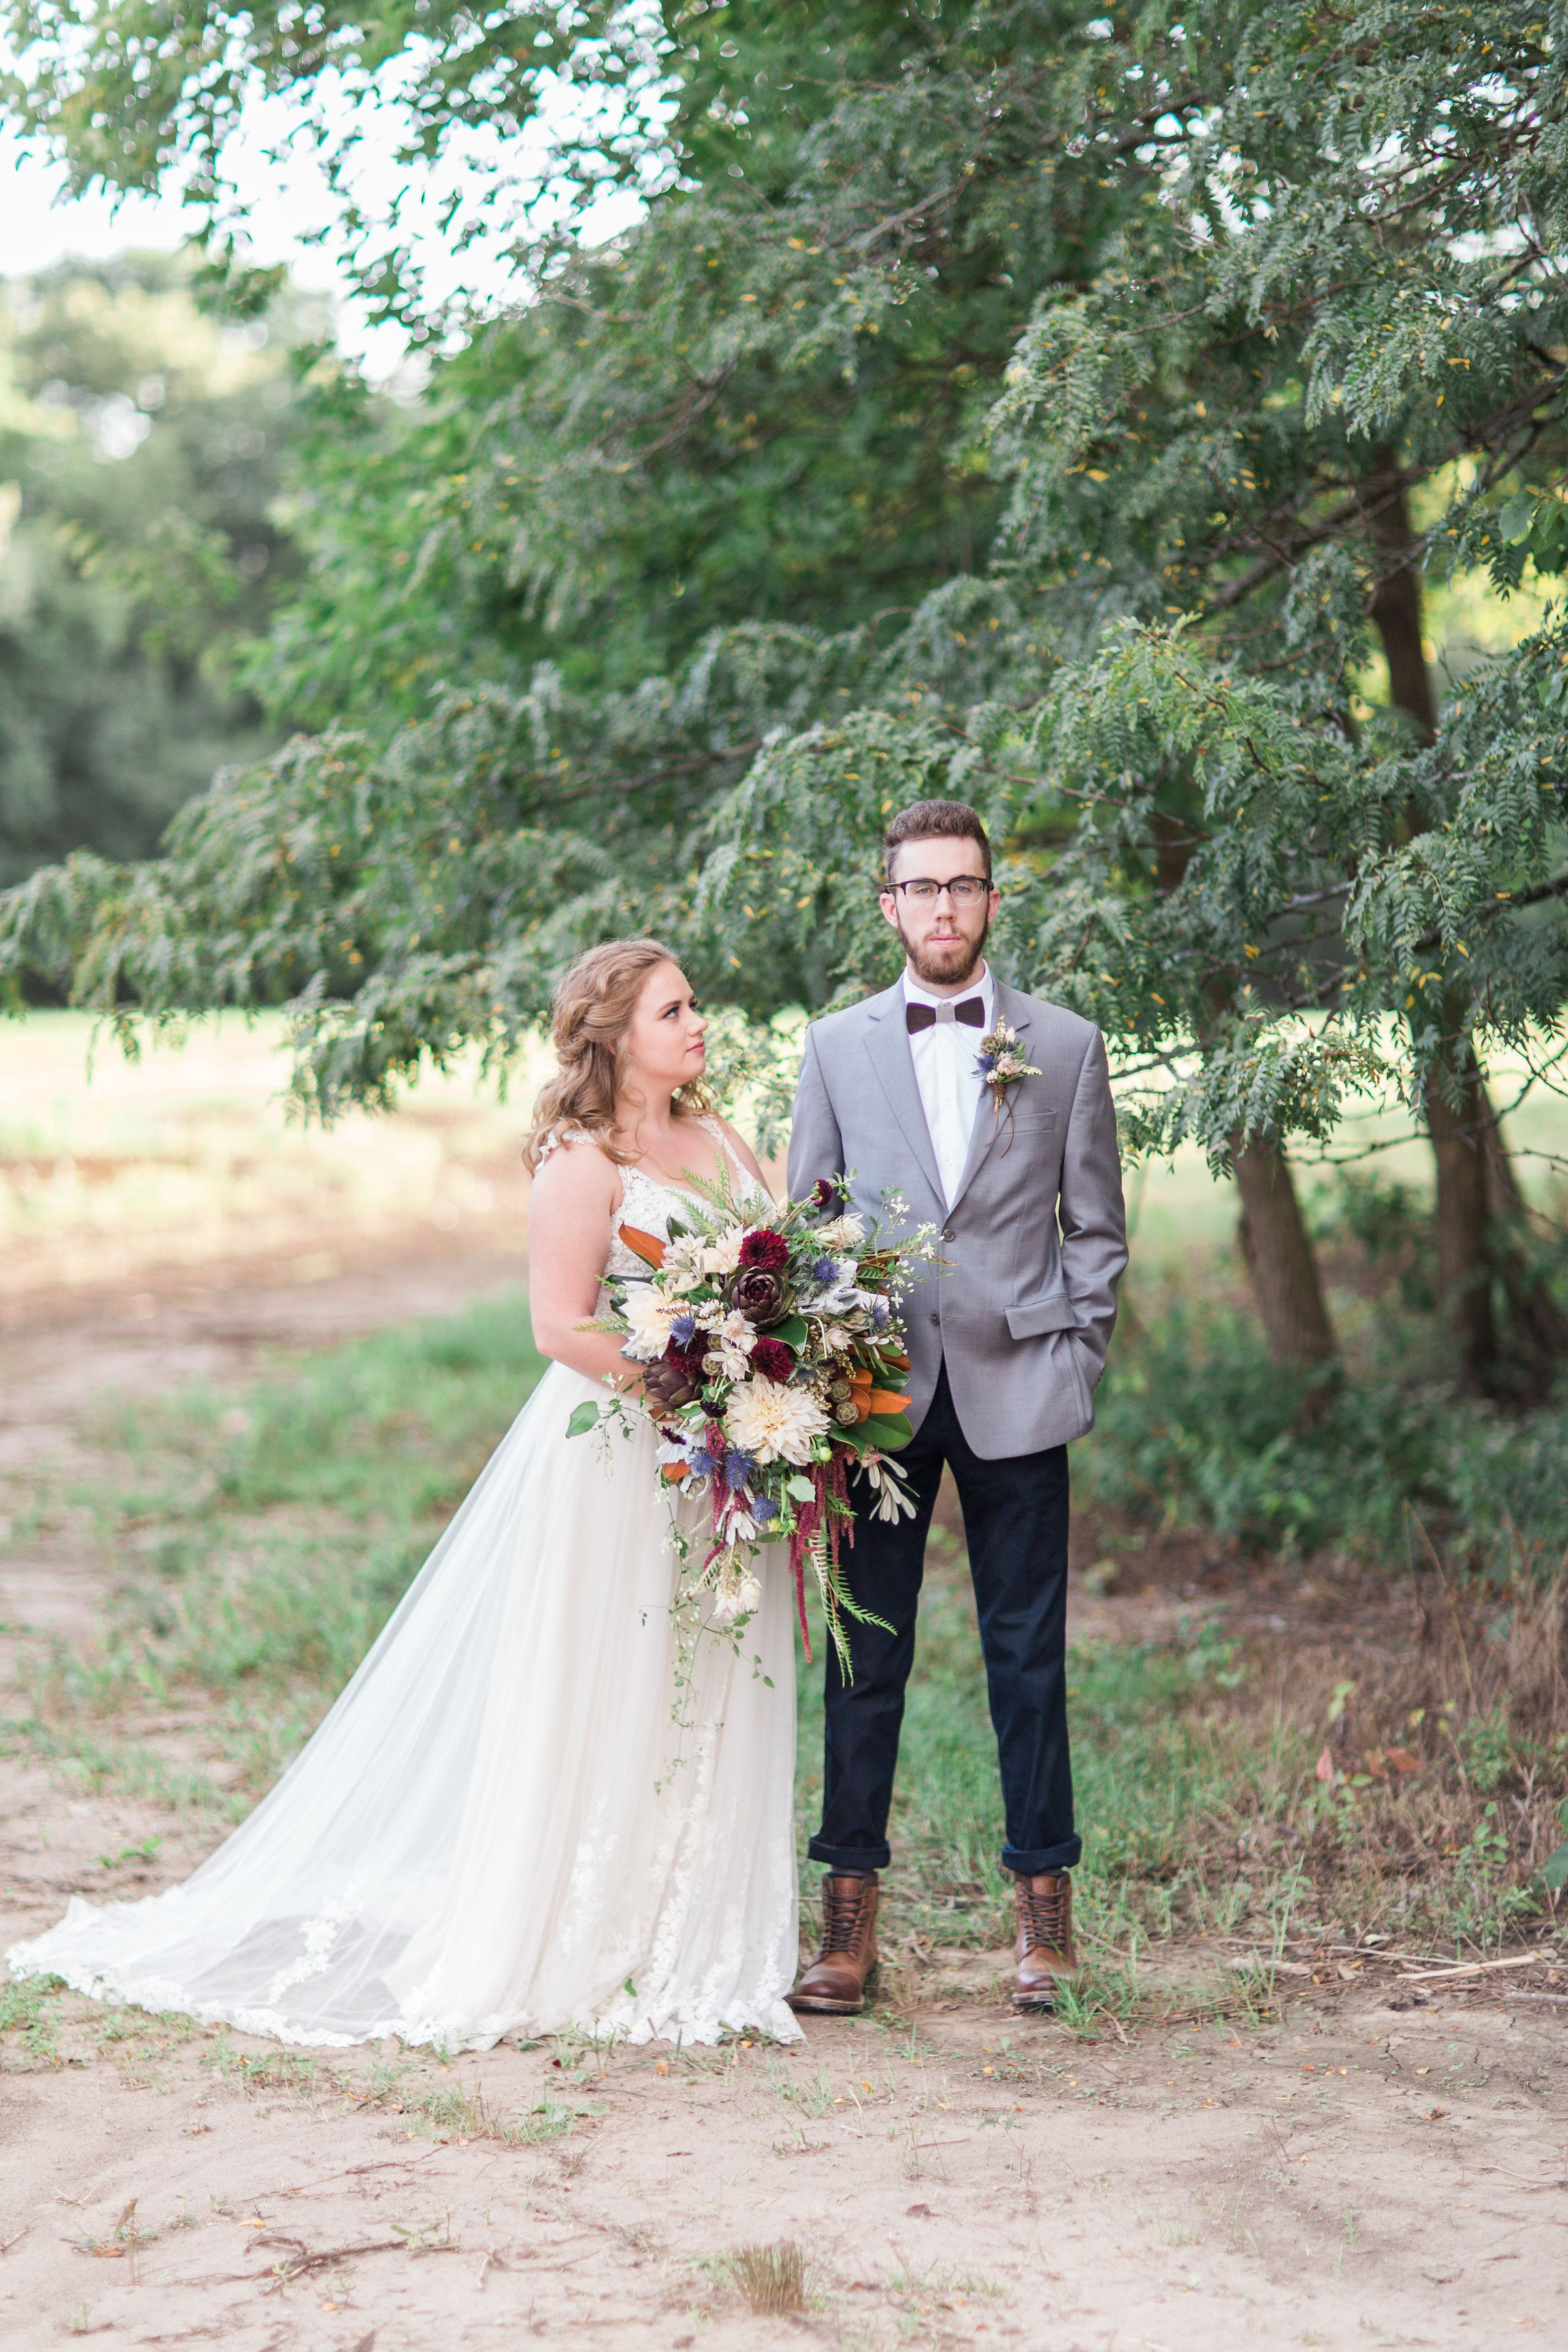 Iowa Venue Adel Rustic Wedding Sweetheart Table Chandelier Boho Reception Country Lane Lodge Mostly Becky Weddings For More: Okoboji Iowa Wedding Venues At Reisefeber.org